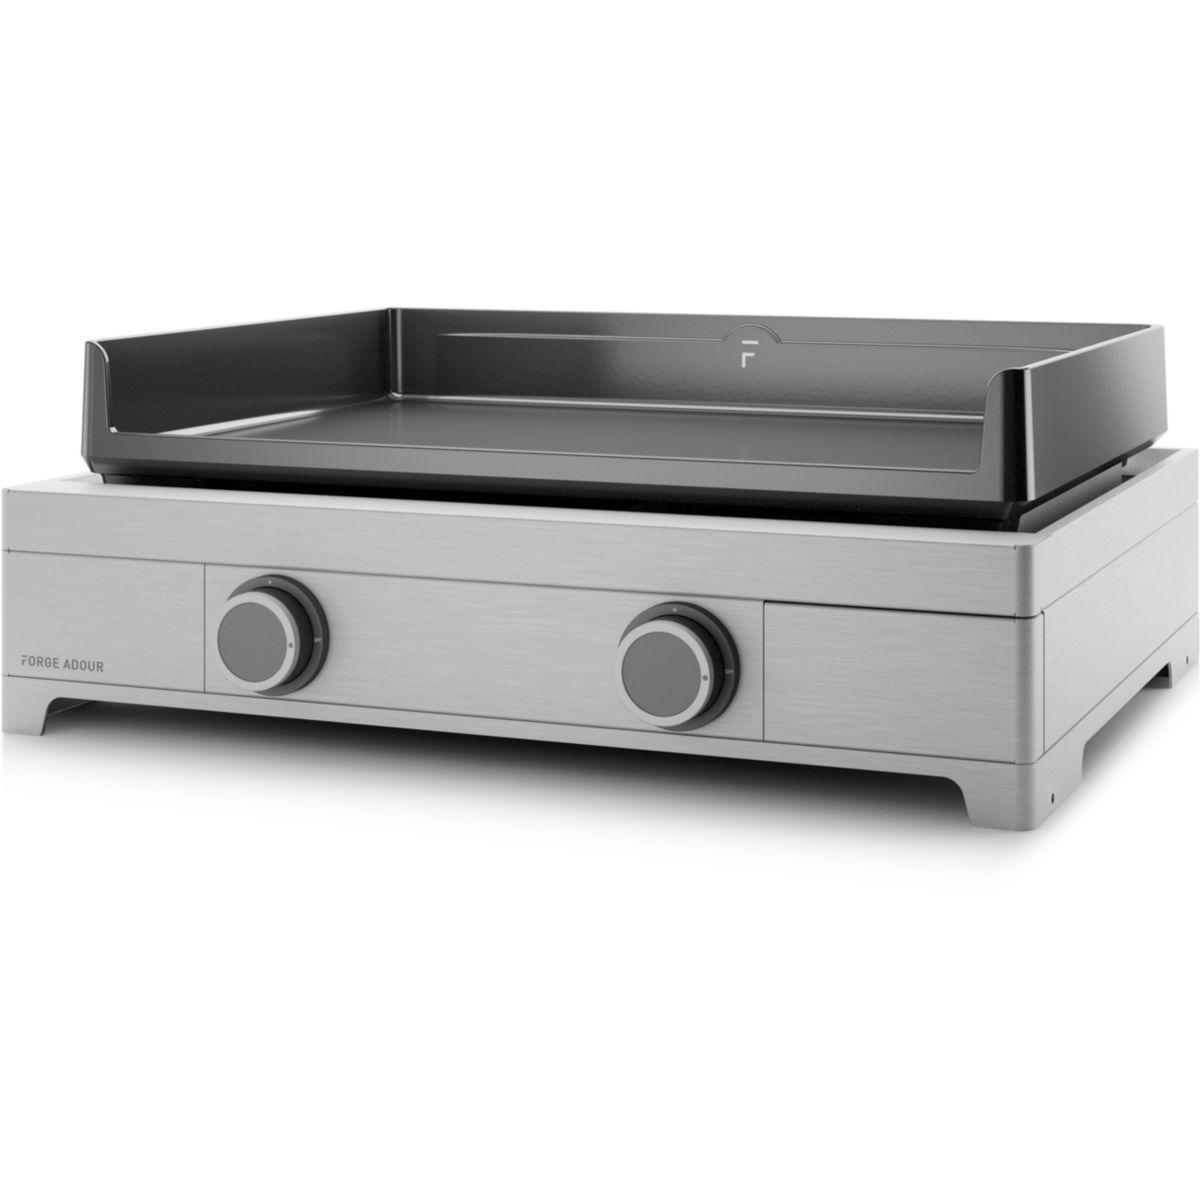 plancha inox achat vente de plancha pas cher. Black Bedroom Furniture Sets. Home Design Ideas